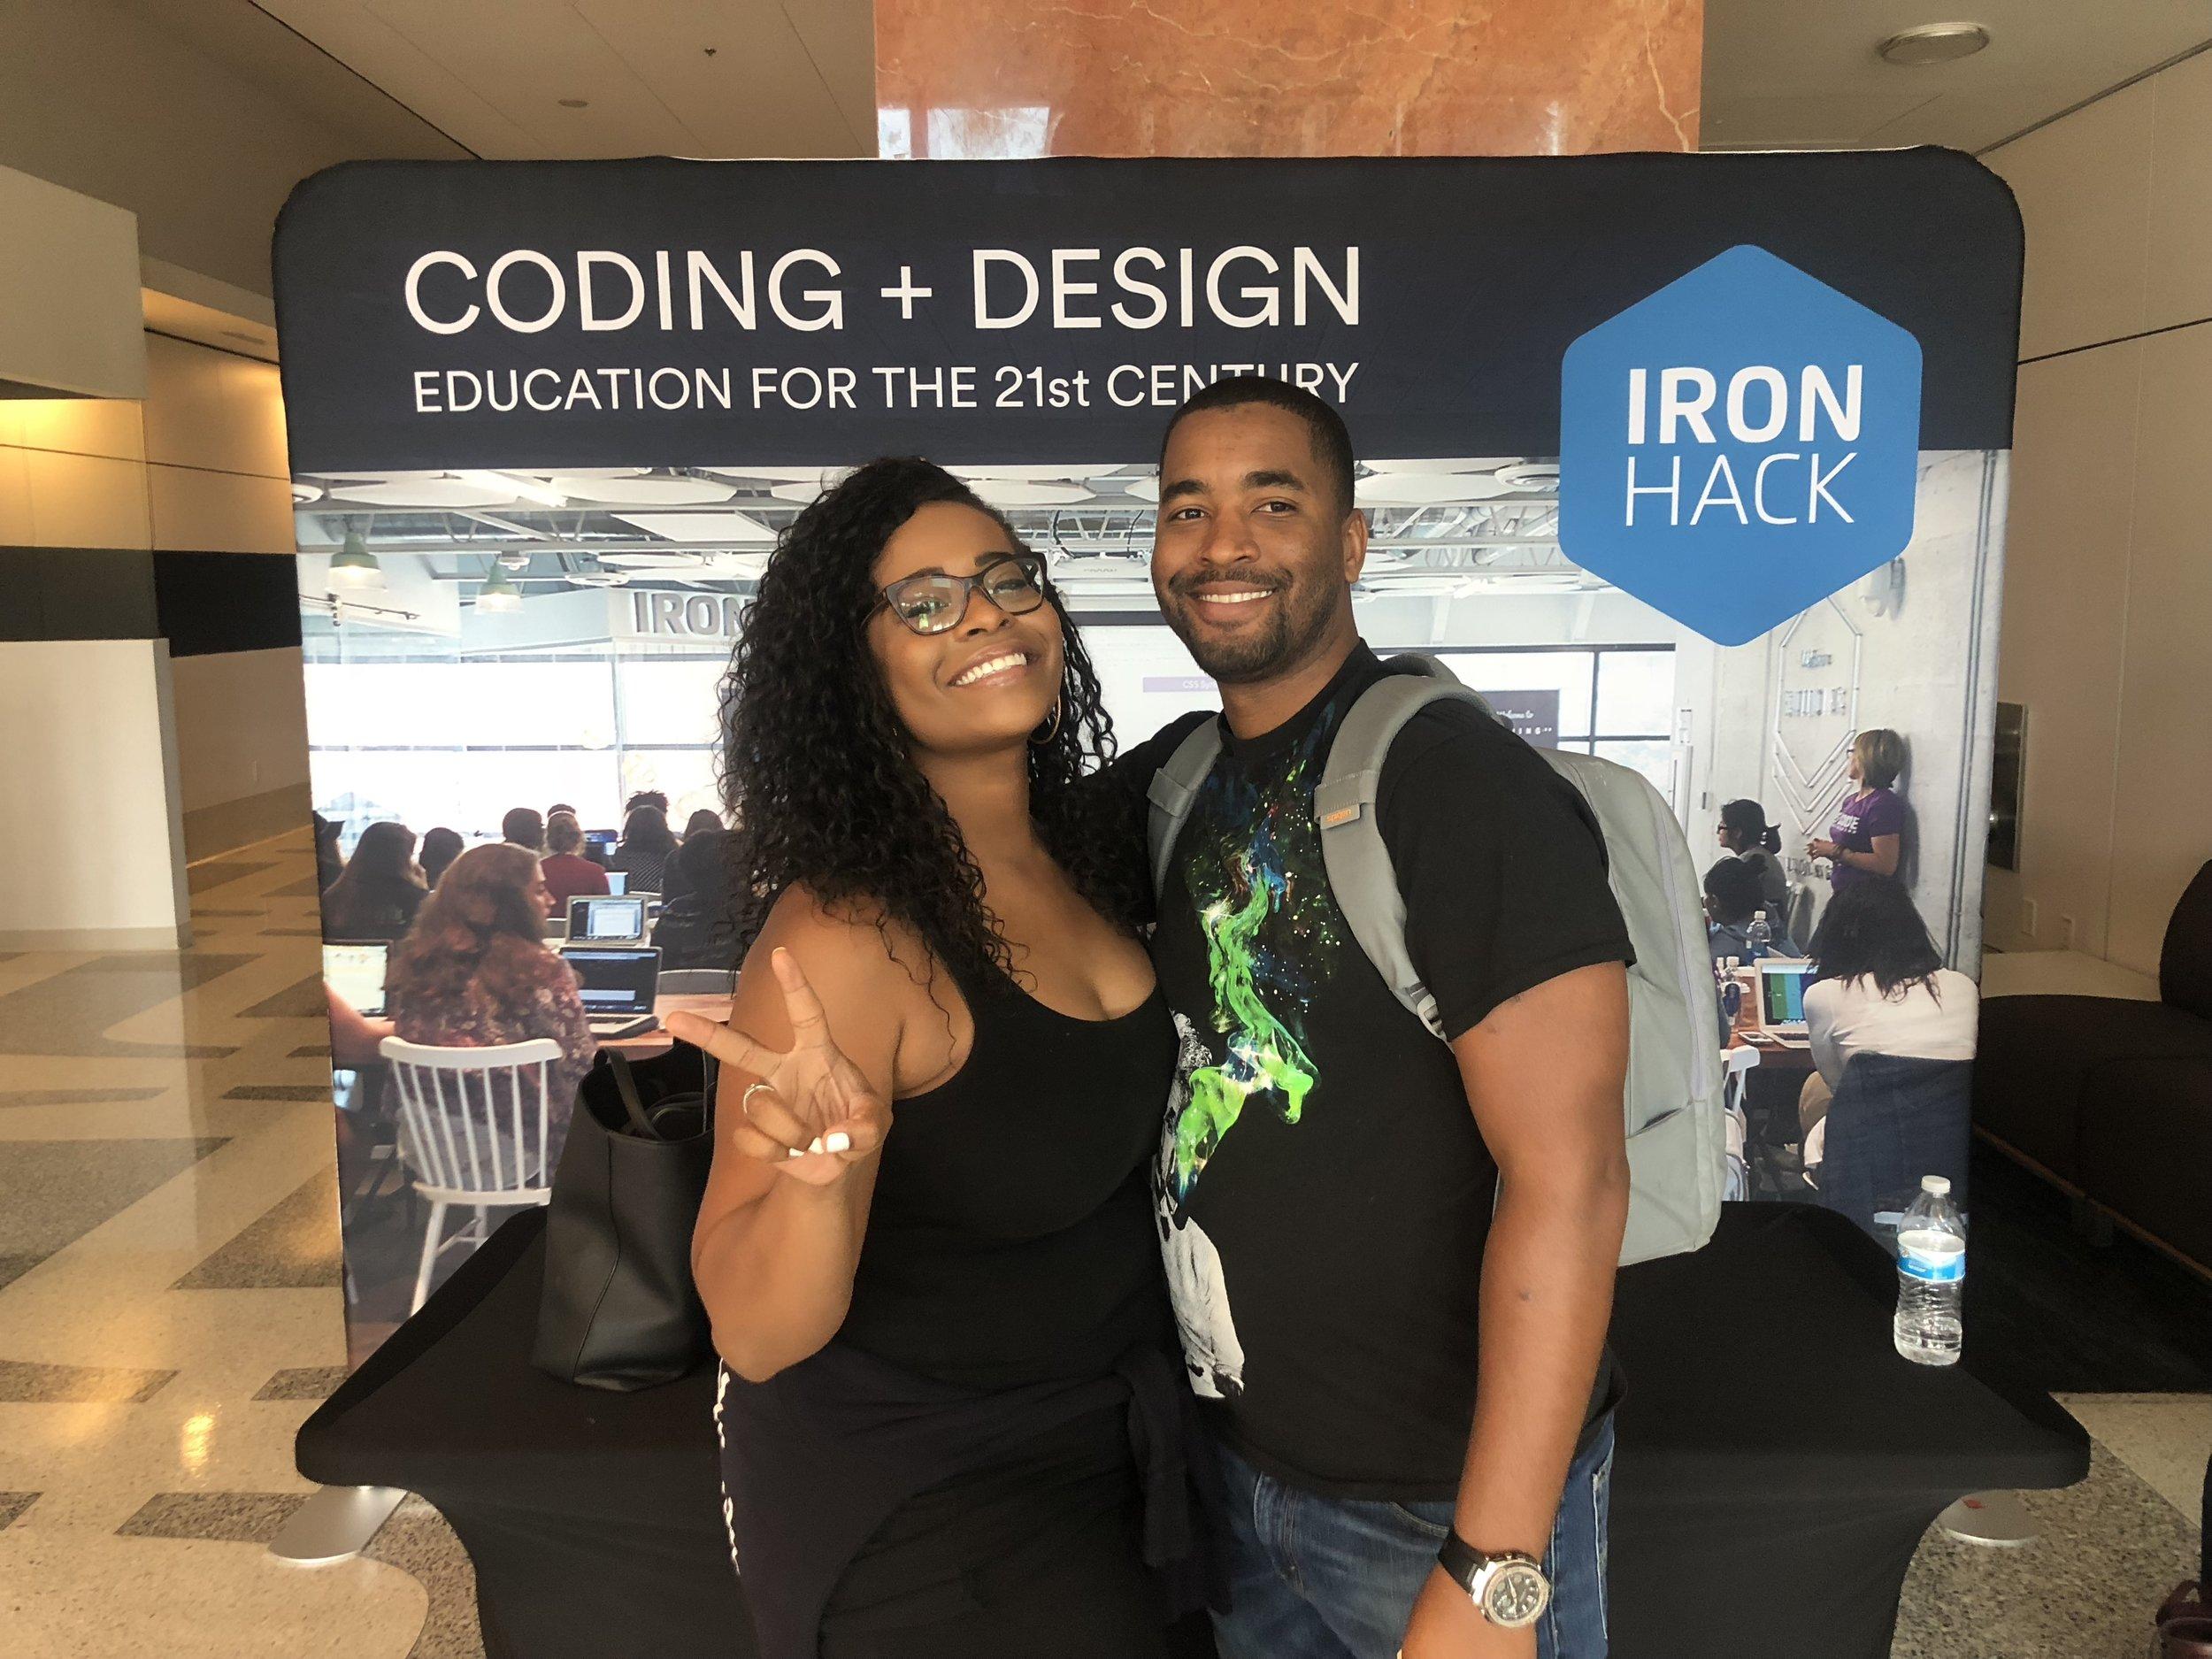 iron hack.jpg